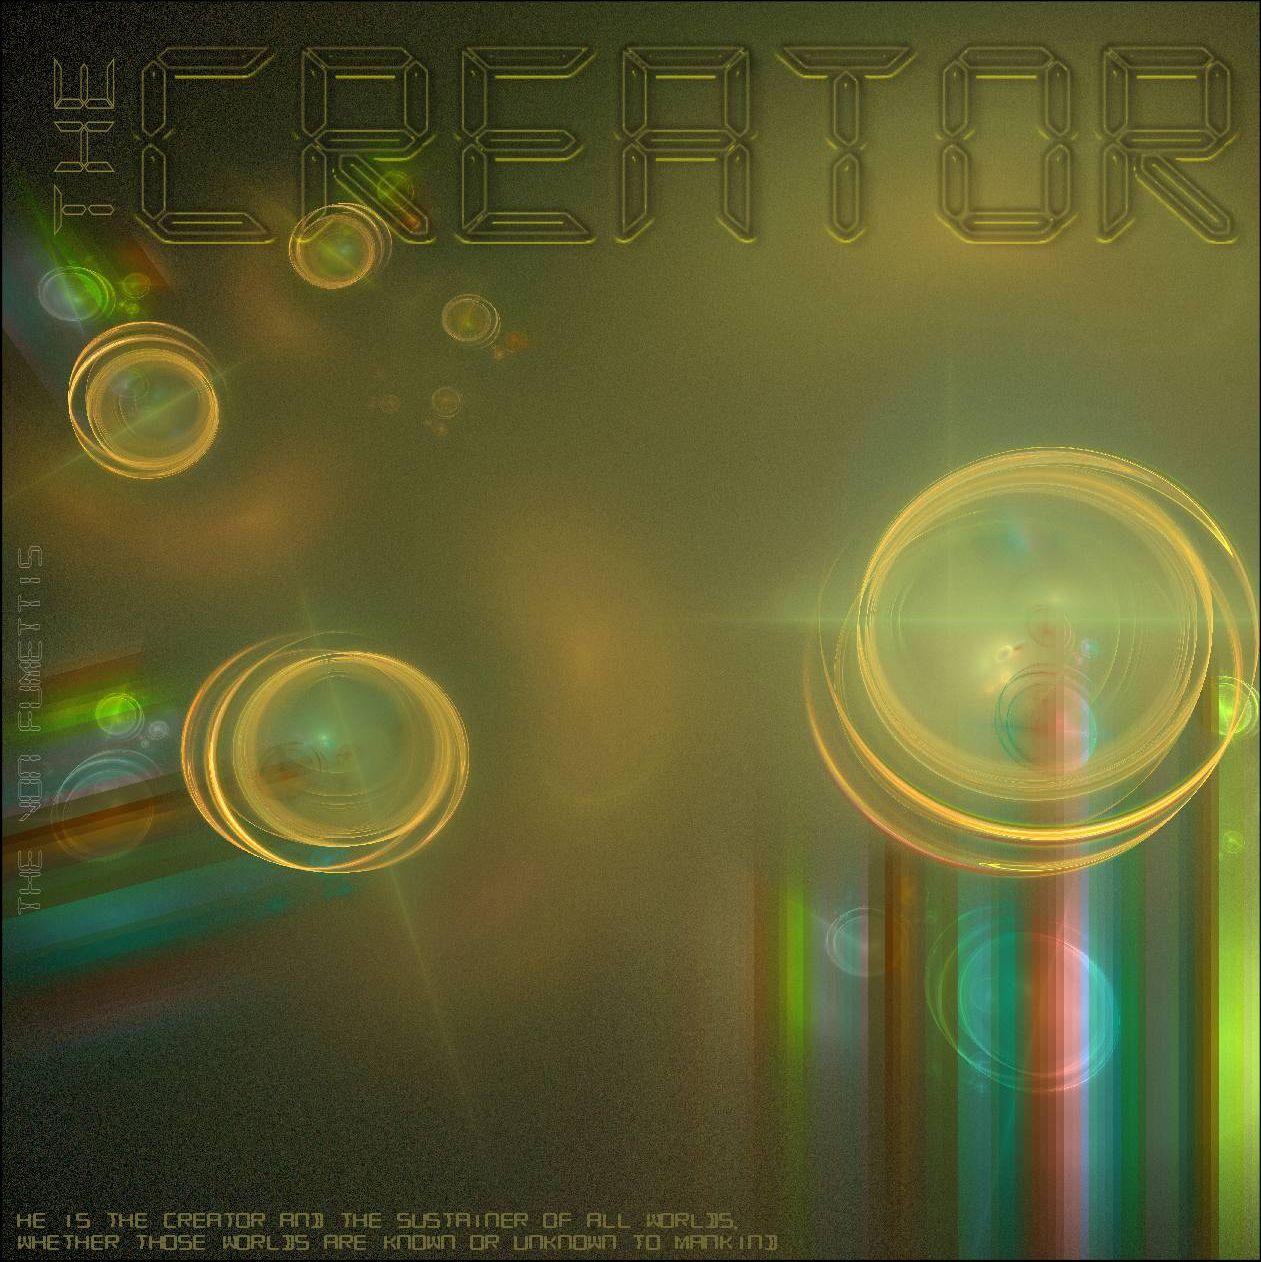 creator lp 2.jpg